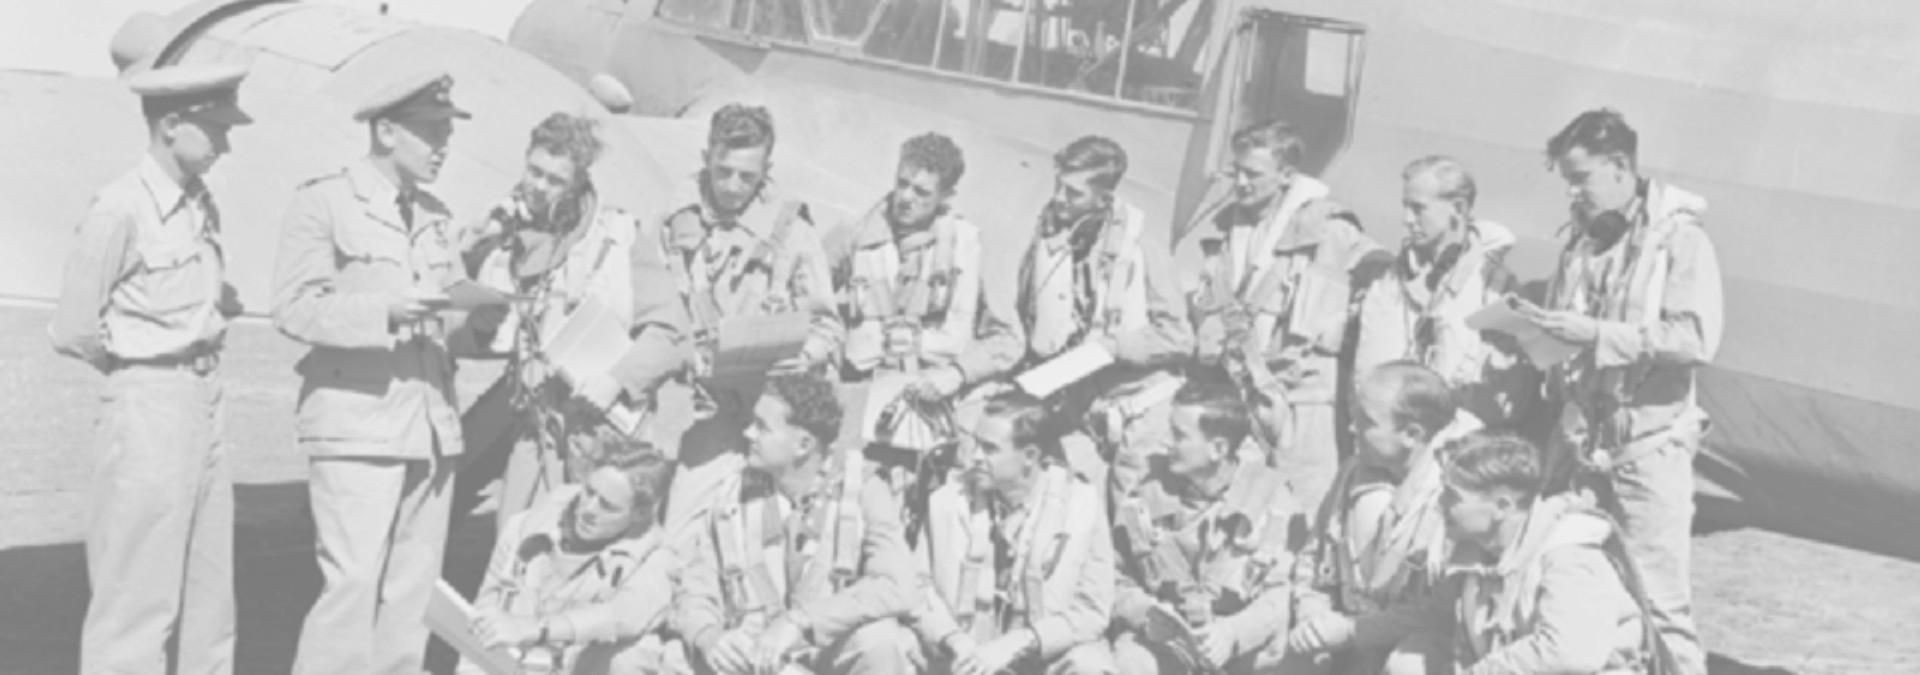 No. 1 Wireless Air Gunners School Ballarat<br>1940 -1945